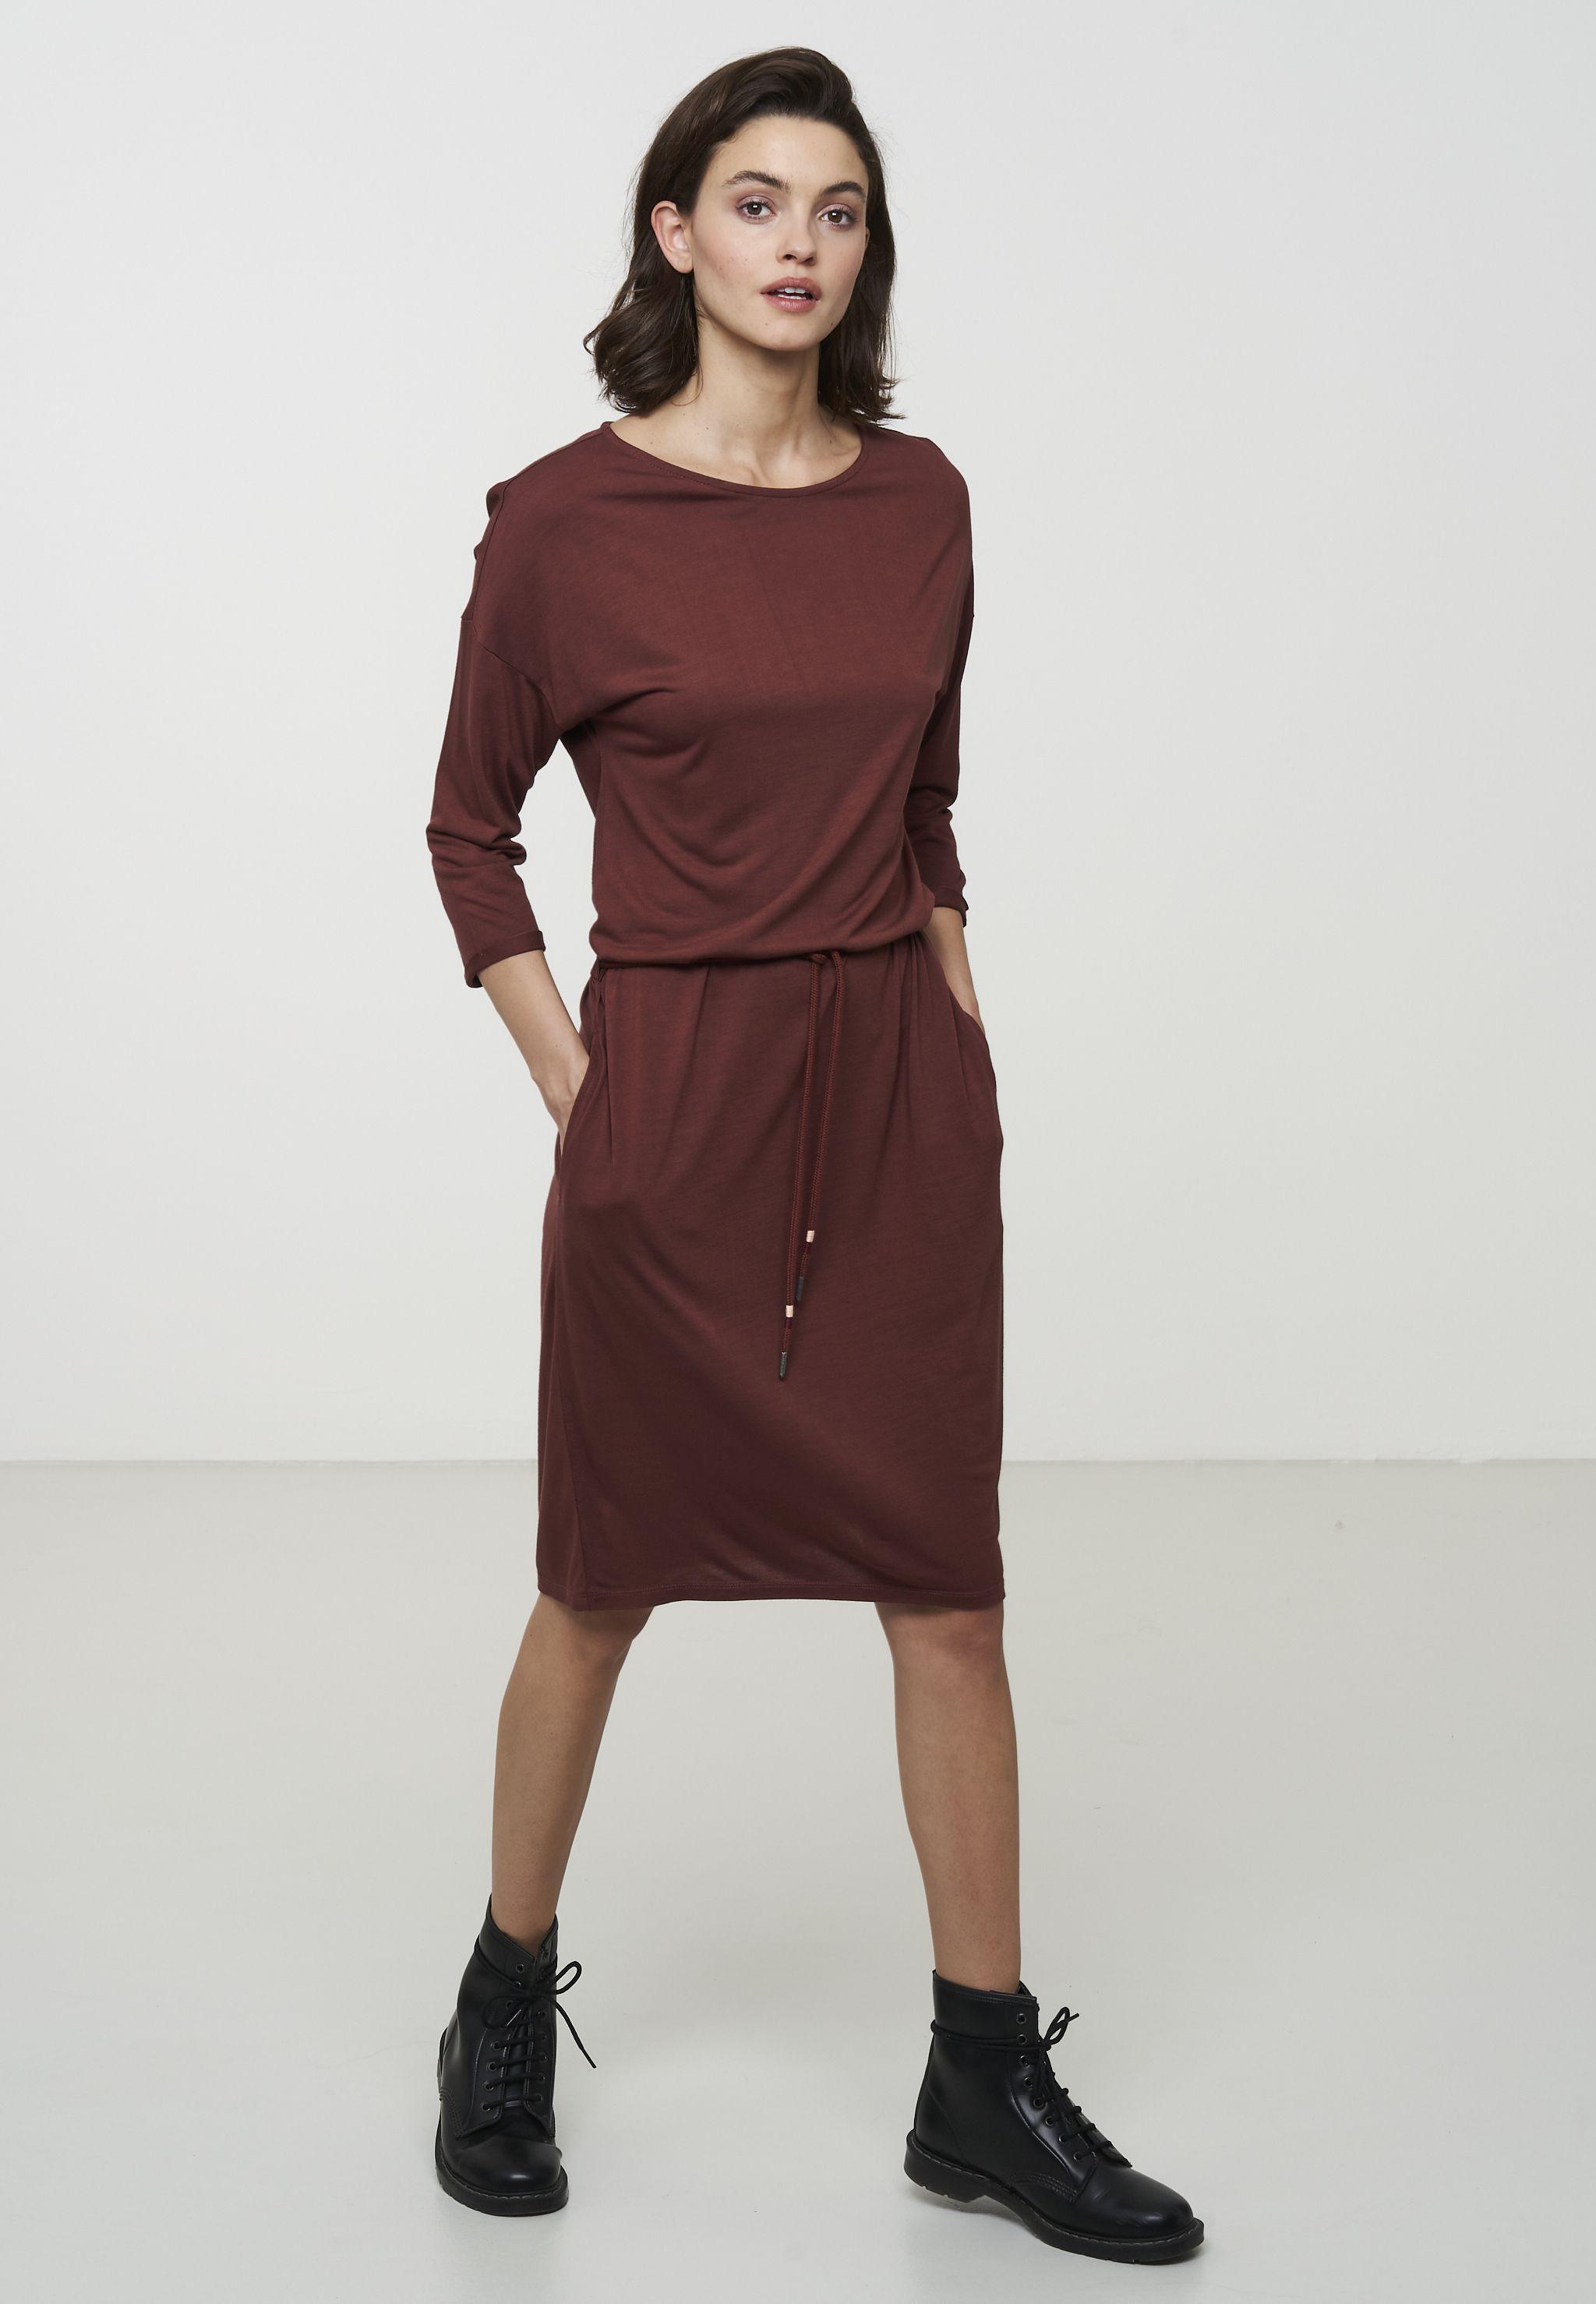 Damen-Kleid ARALIA ruby red